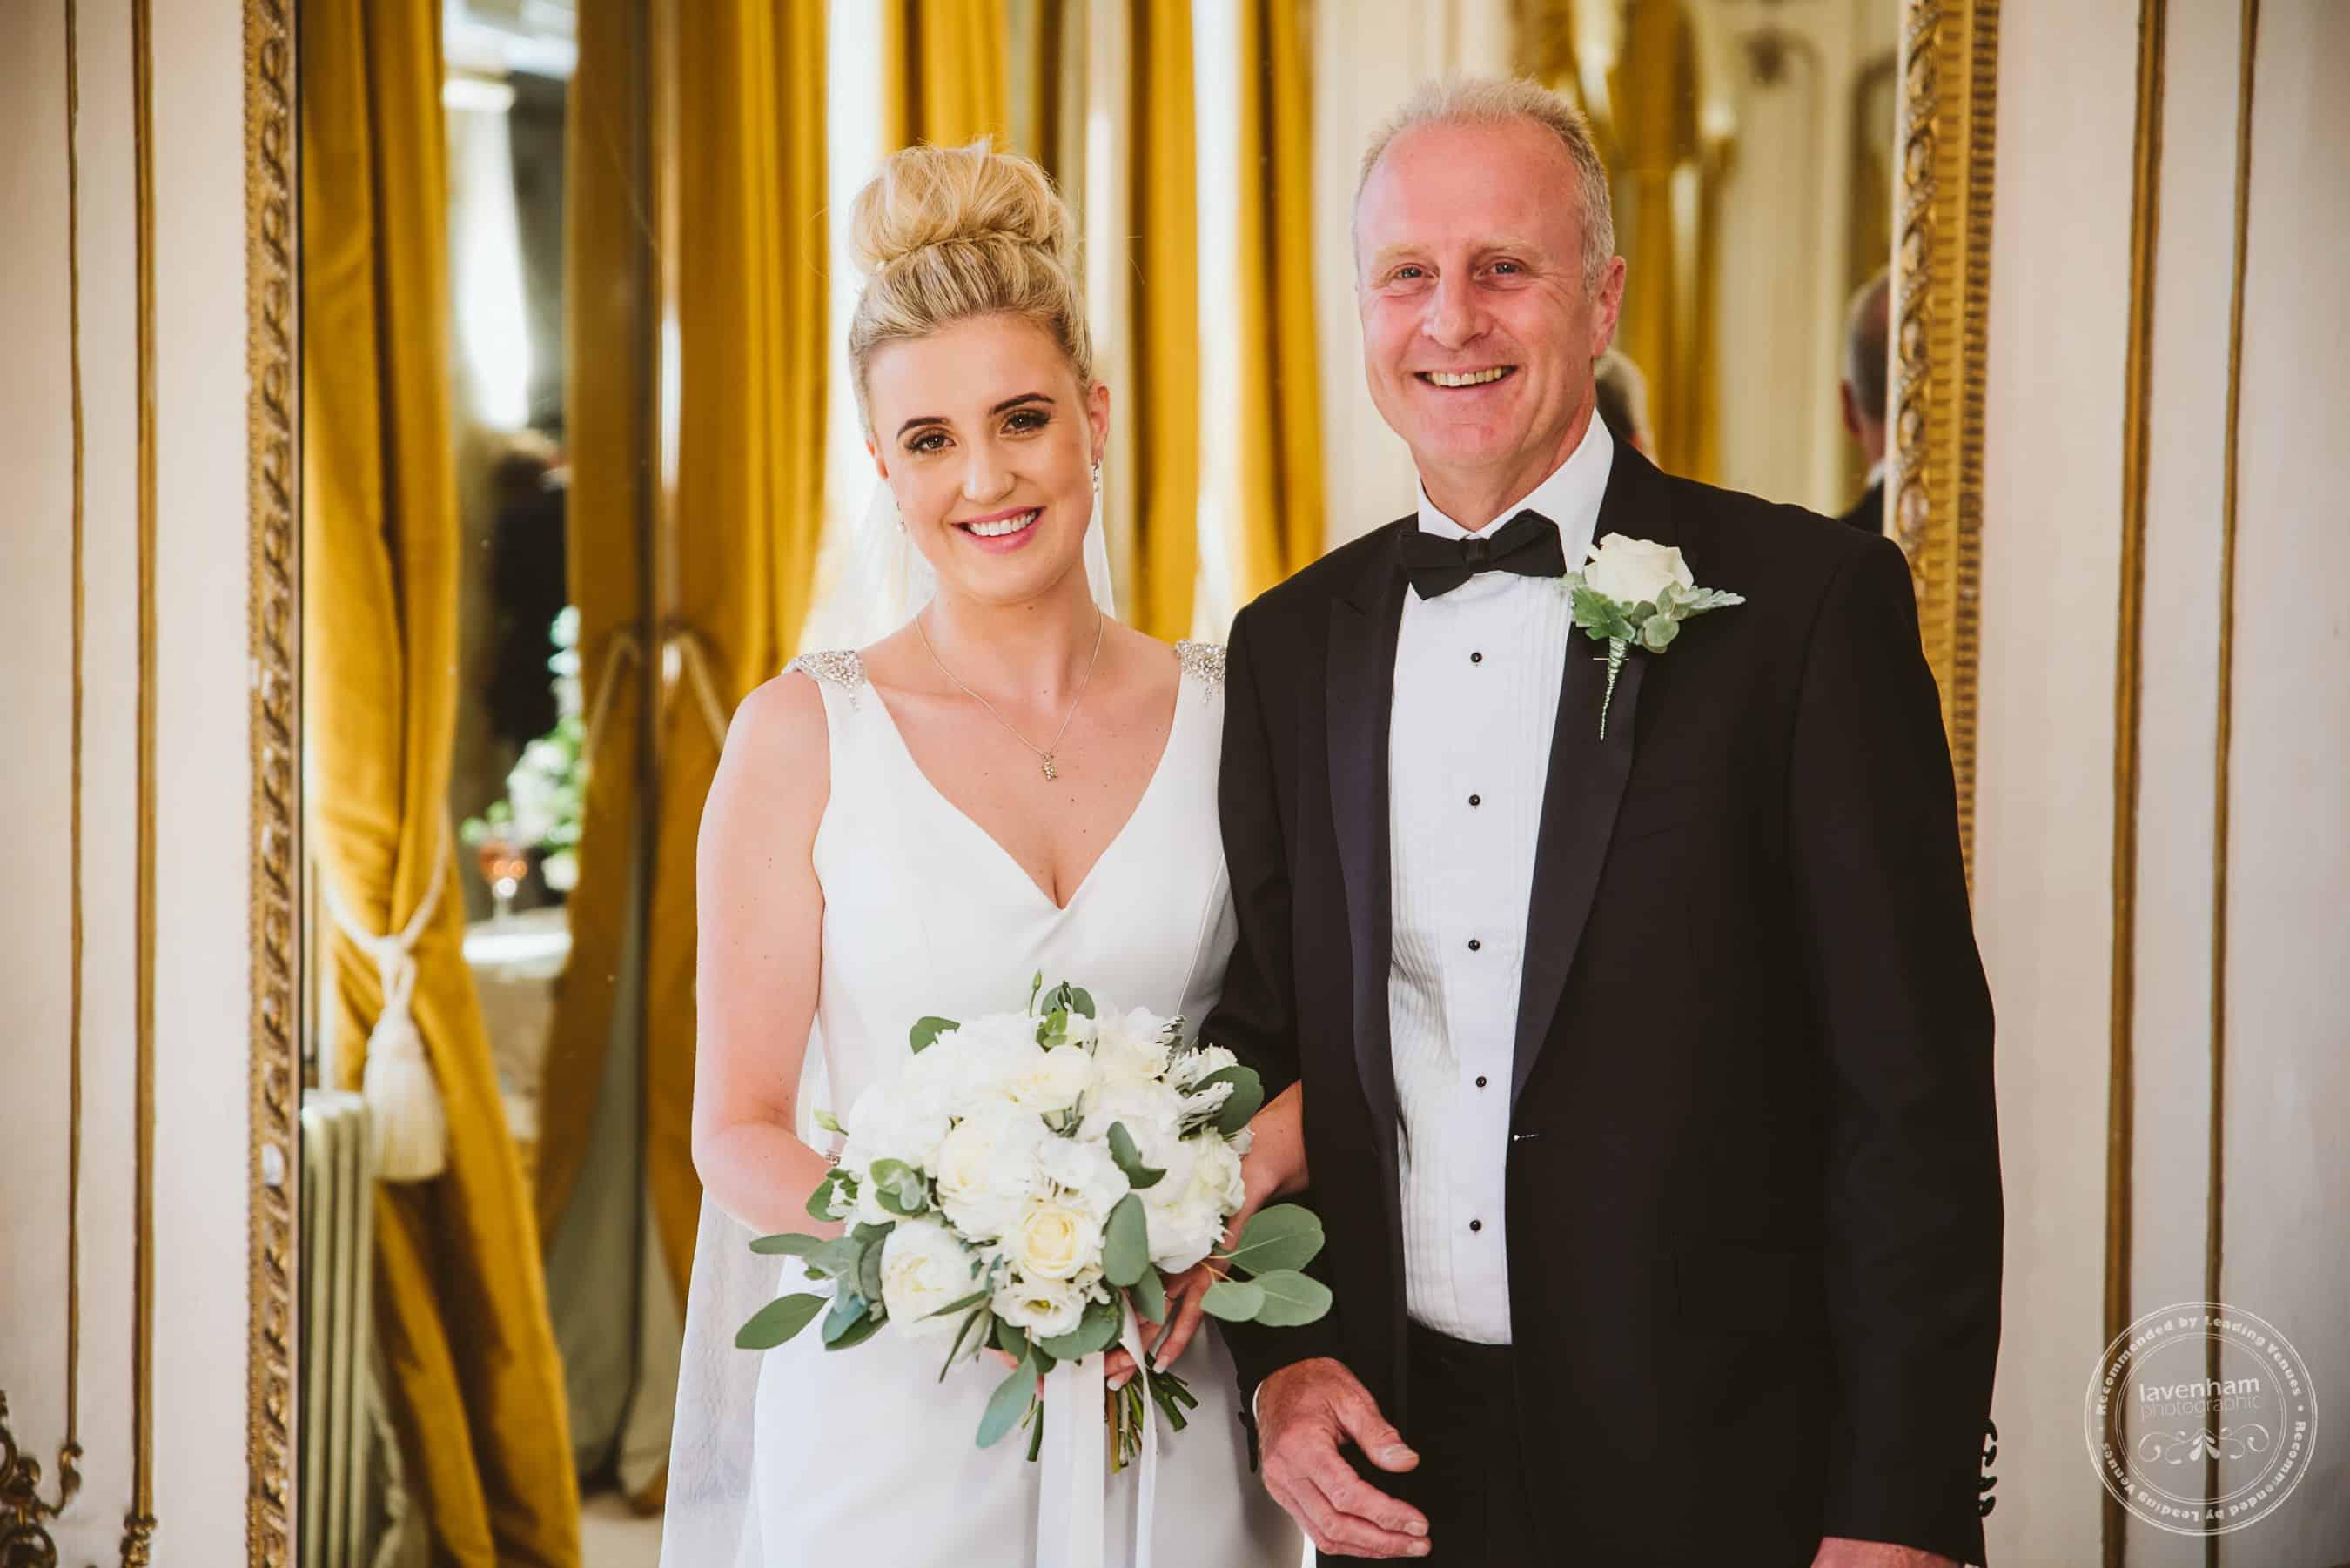 220618 Gosfield Hall Wedding Photography Lavenham Photographic 0042